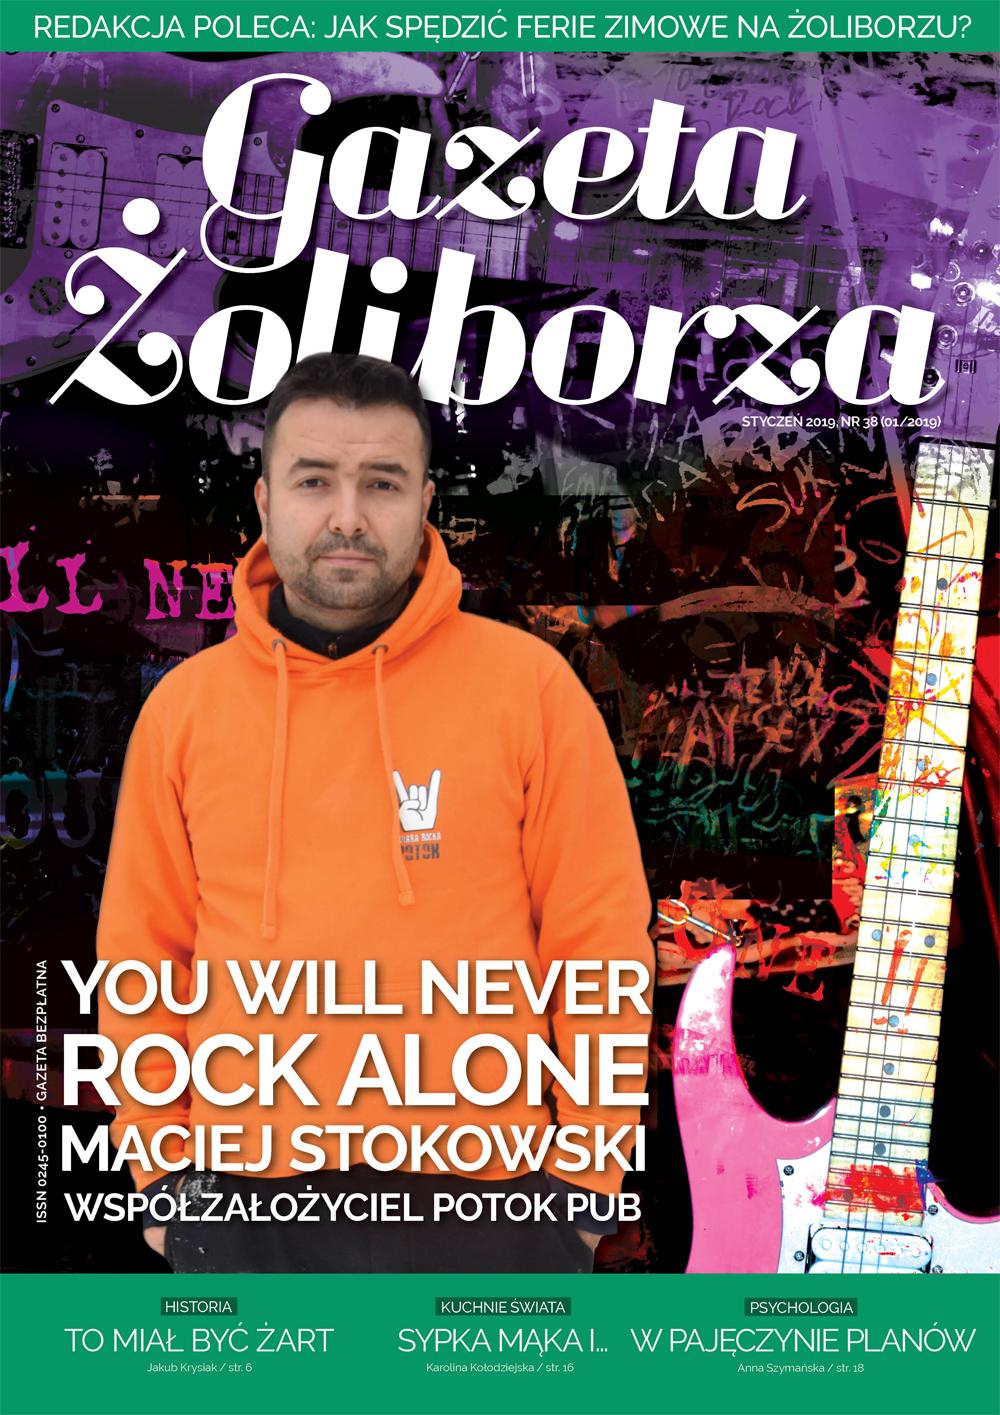 Gazeta Żoliborza - 01/2019 (38)